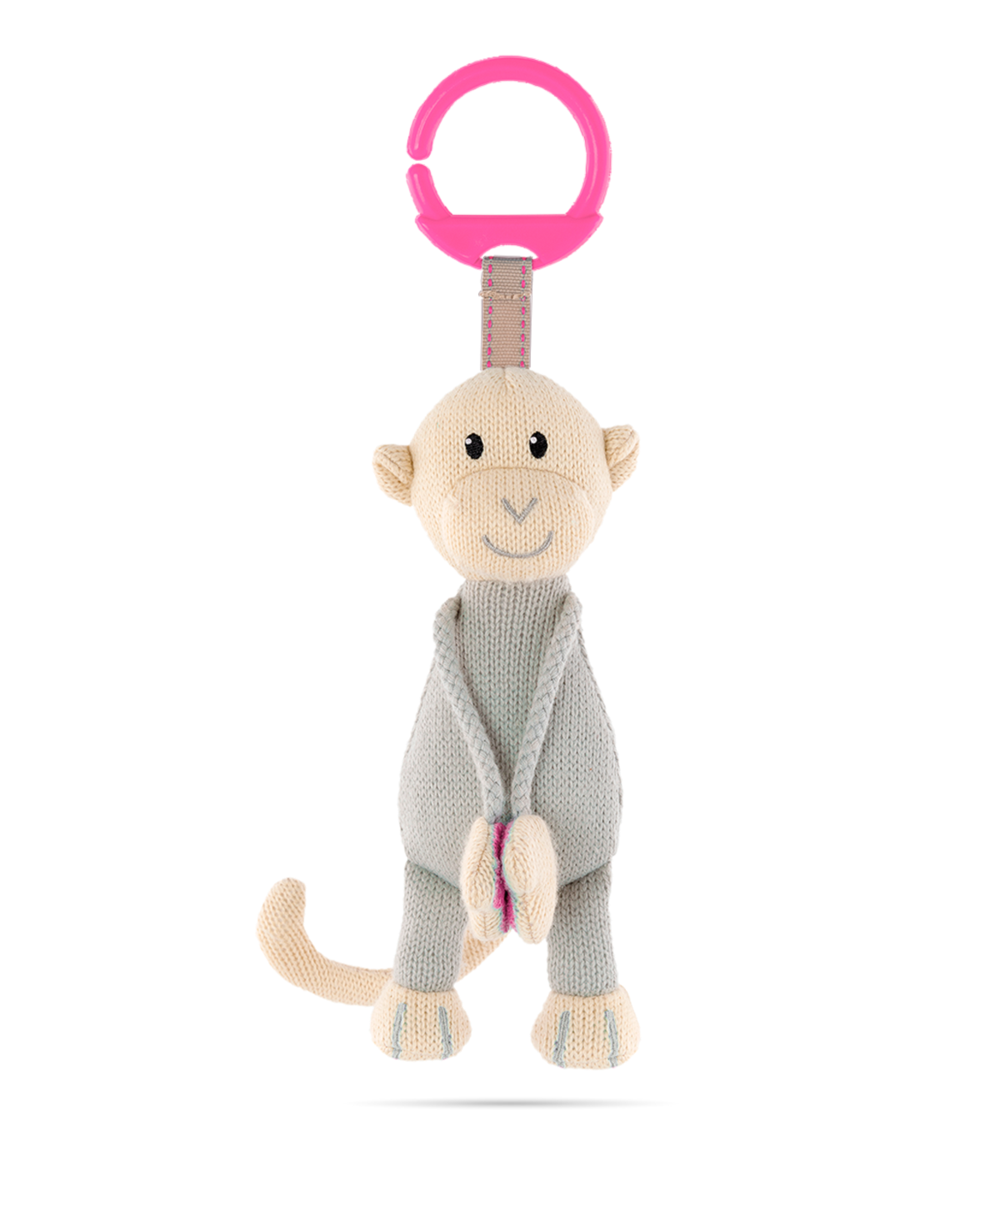 Matchstick Monkey Knitted Hanging Monkey - Pink